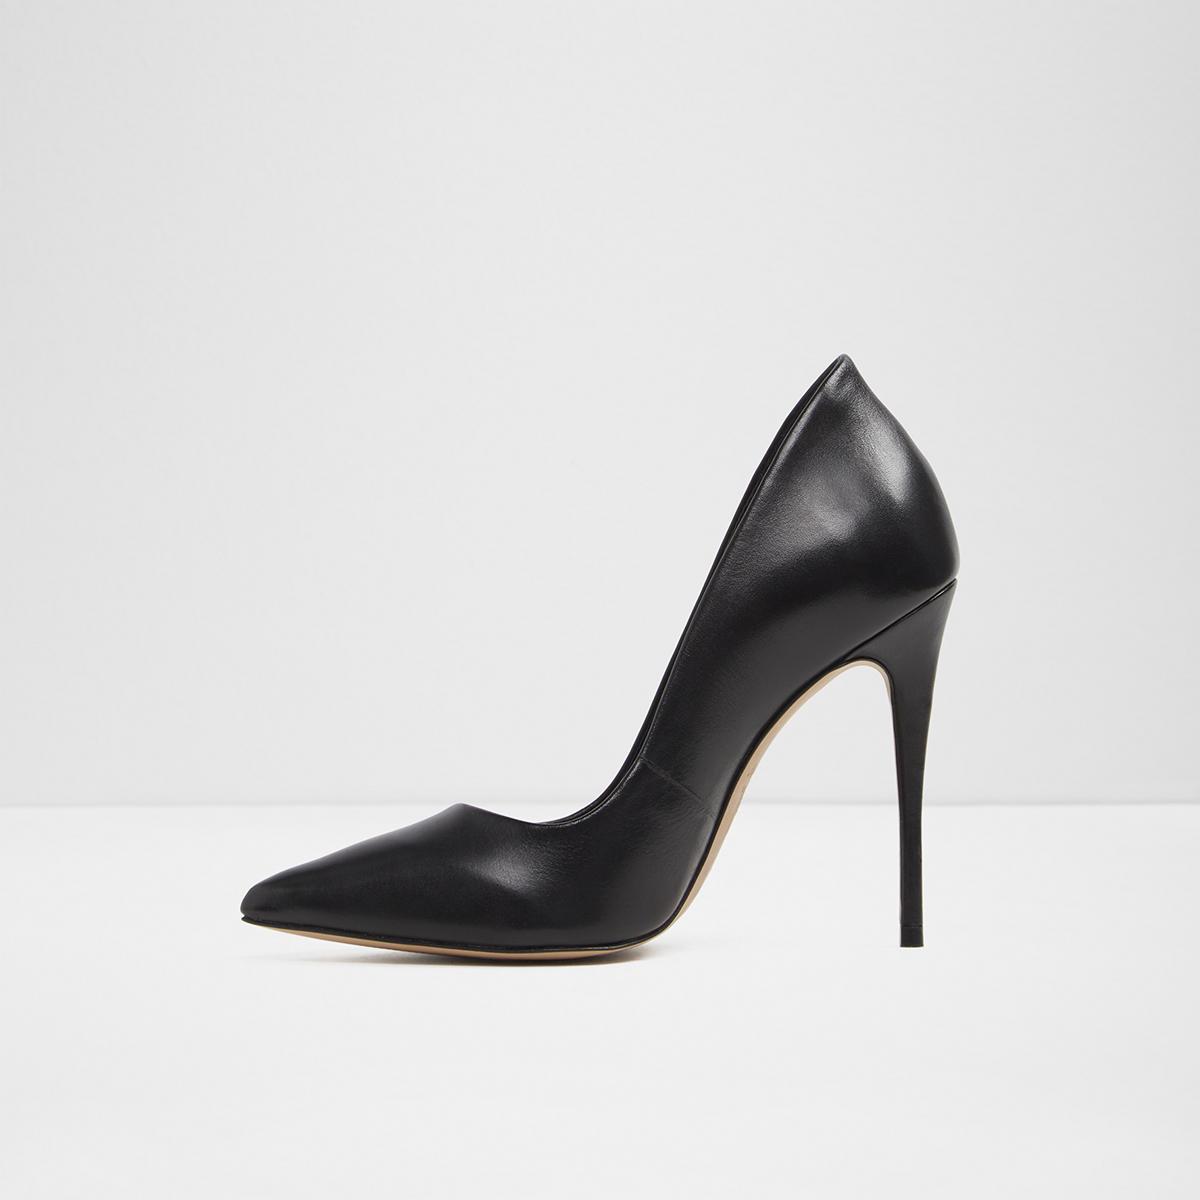 df3b68b0e70 Aldo heels Aldo heels with glitter. Size 7 Aldo Shoes Heels Aldo Heels